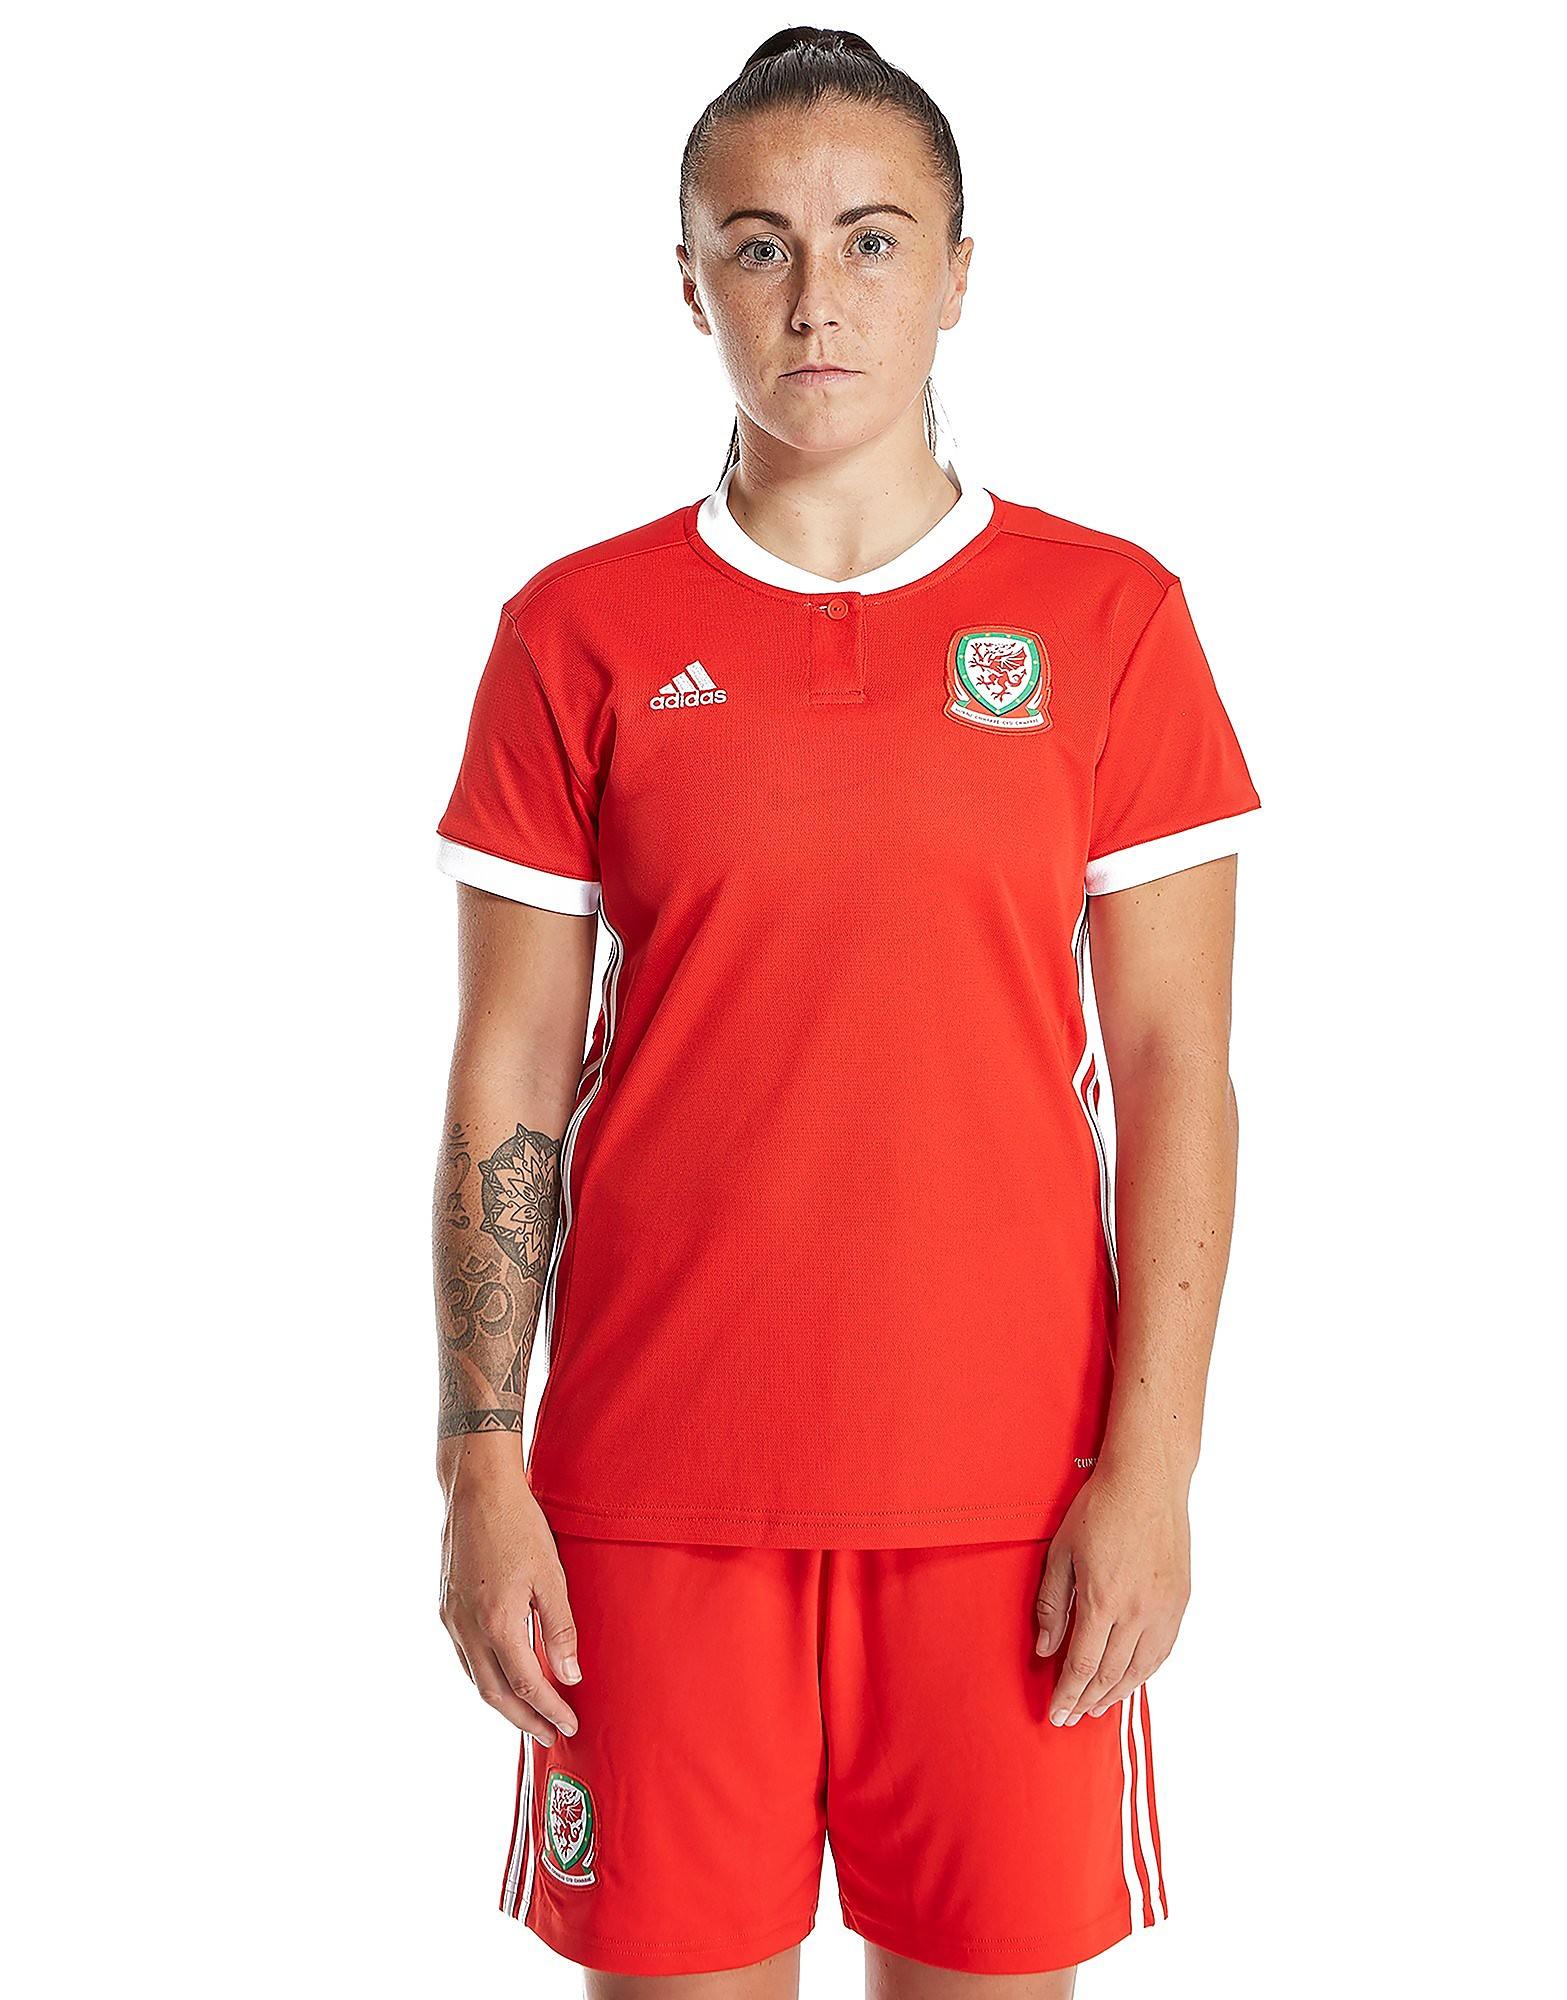 adidas Wales 2017/18 Home Shirt Womens PRE ORDER